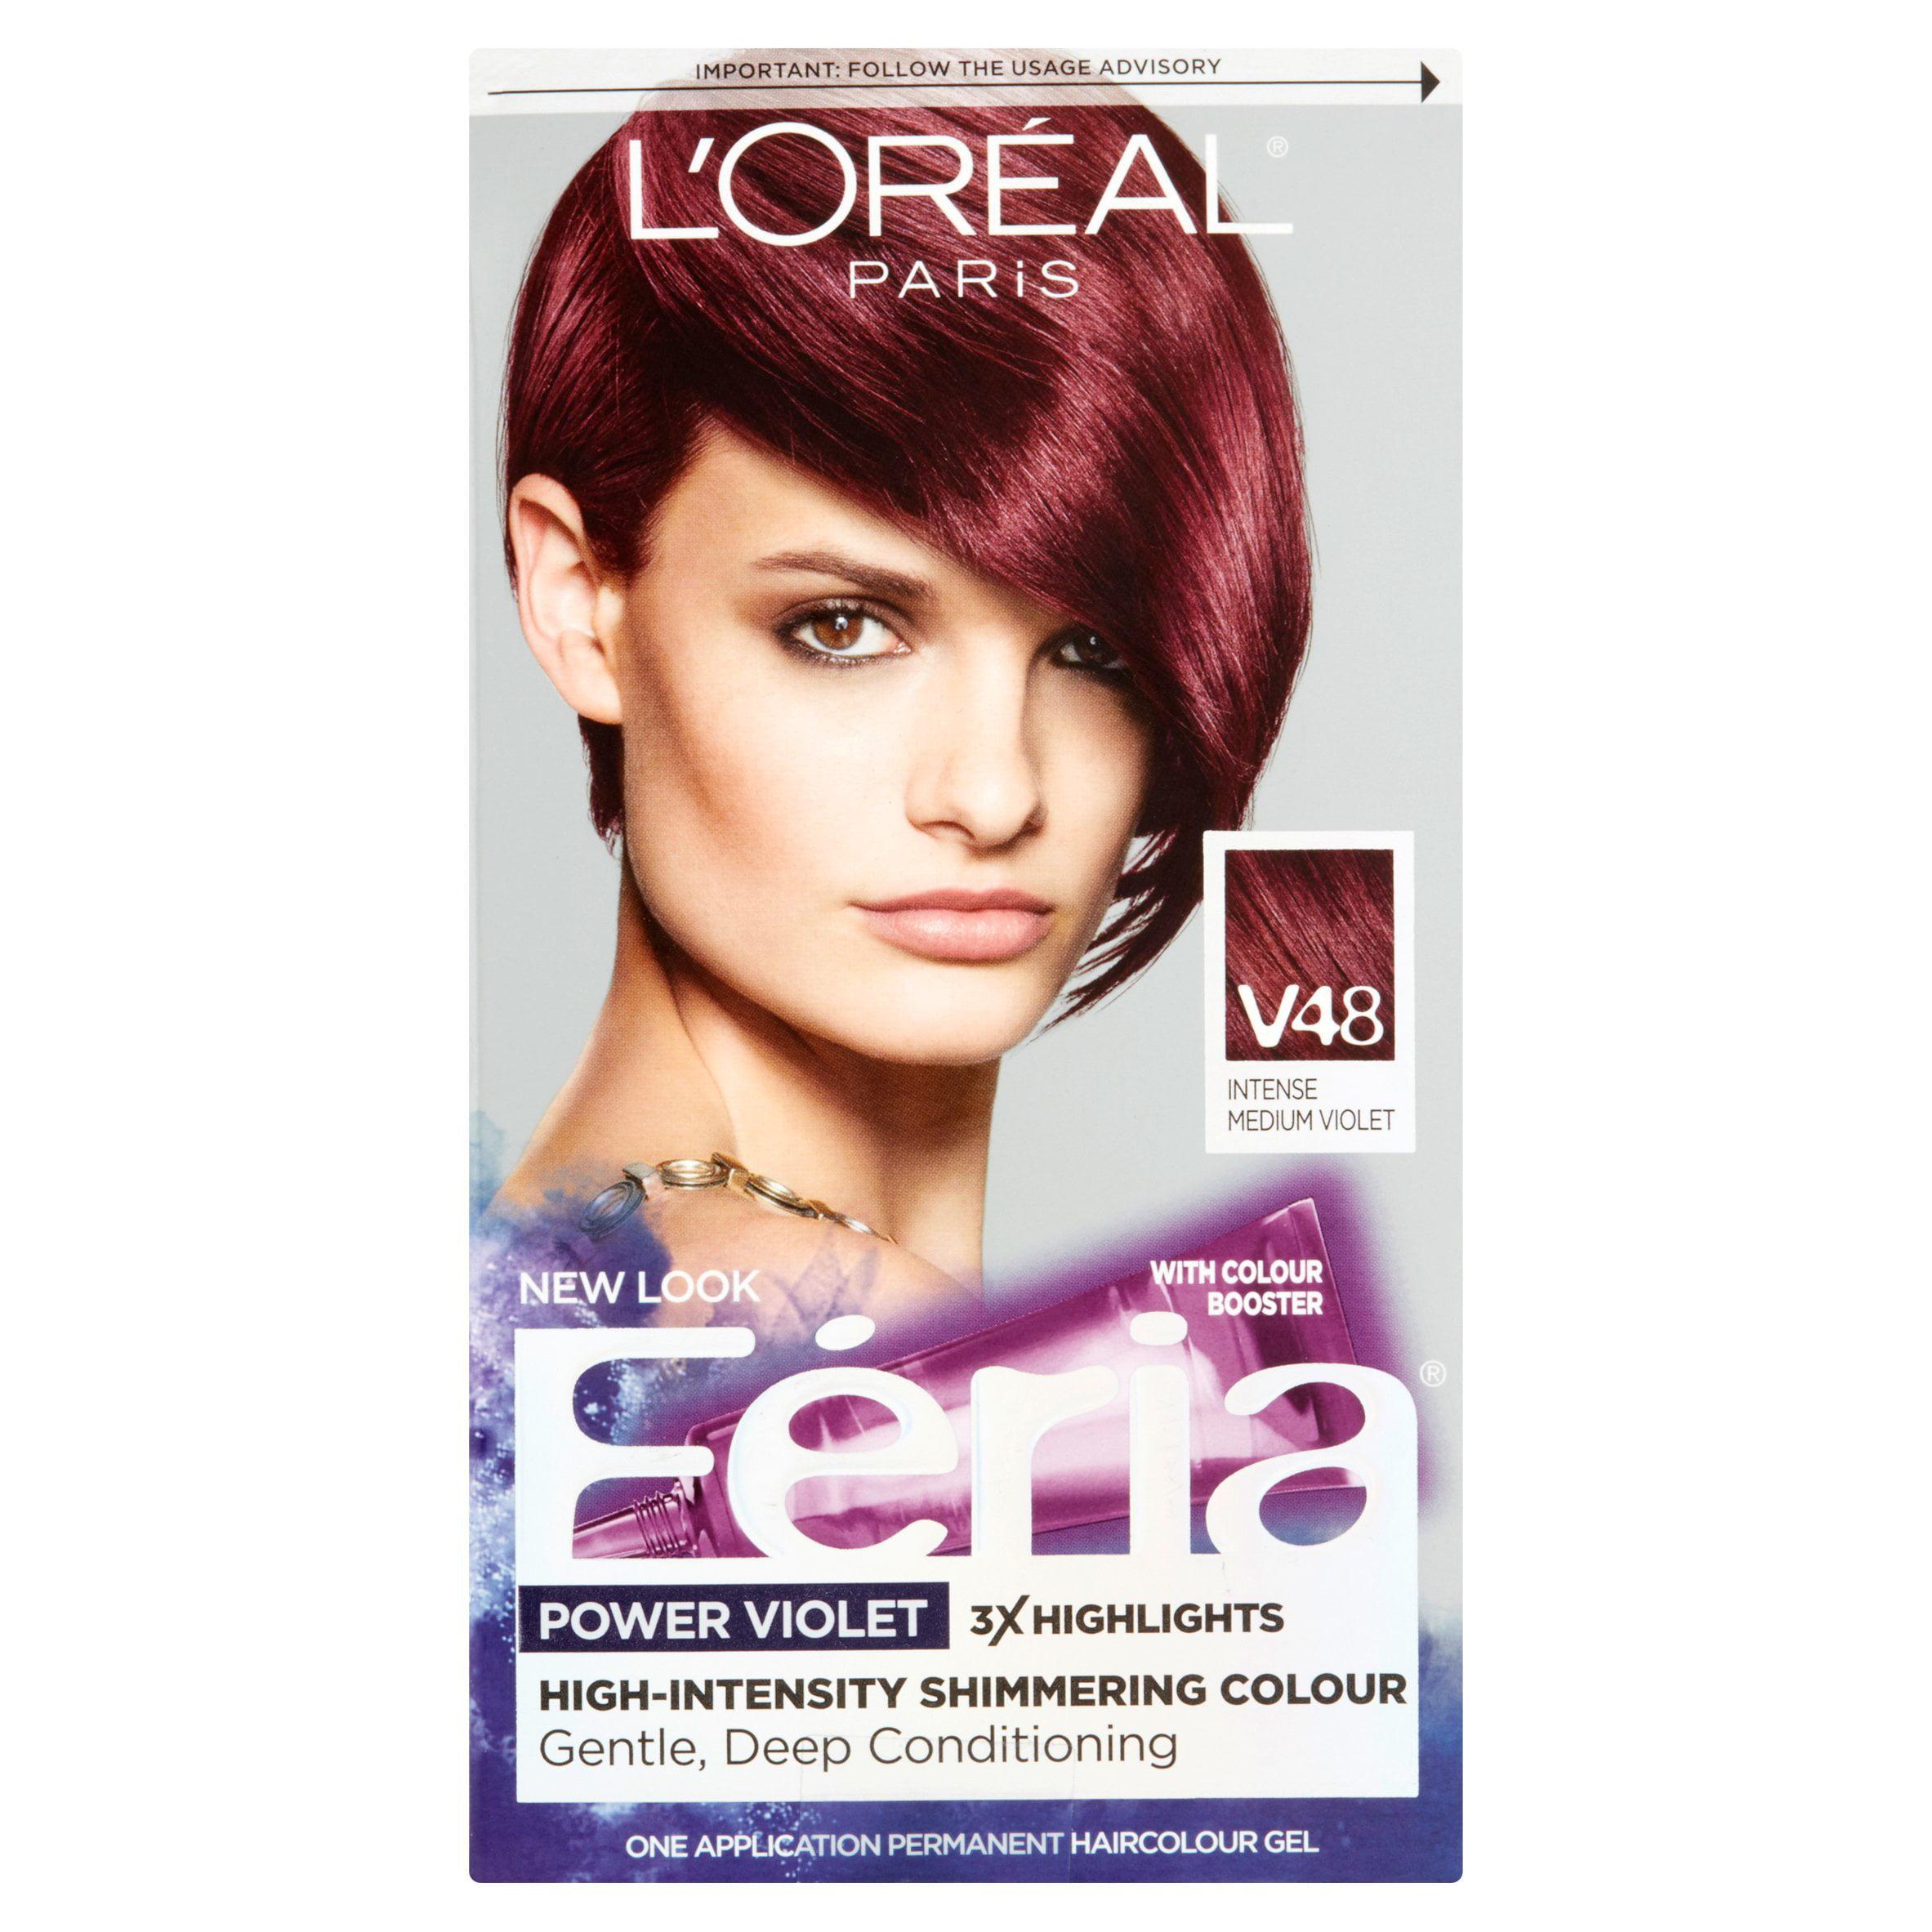 Loreal Paris Feria V48 Intense Medium Violet One Application